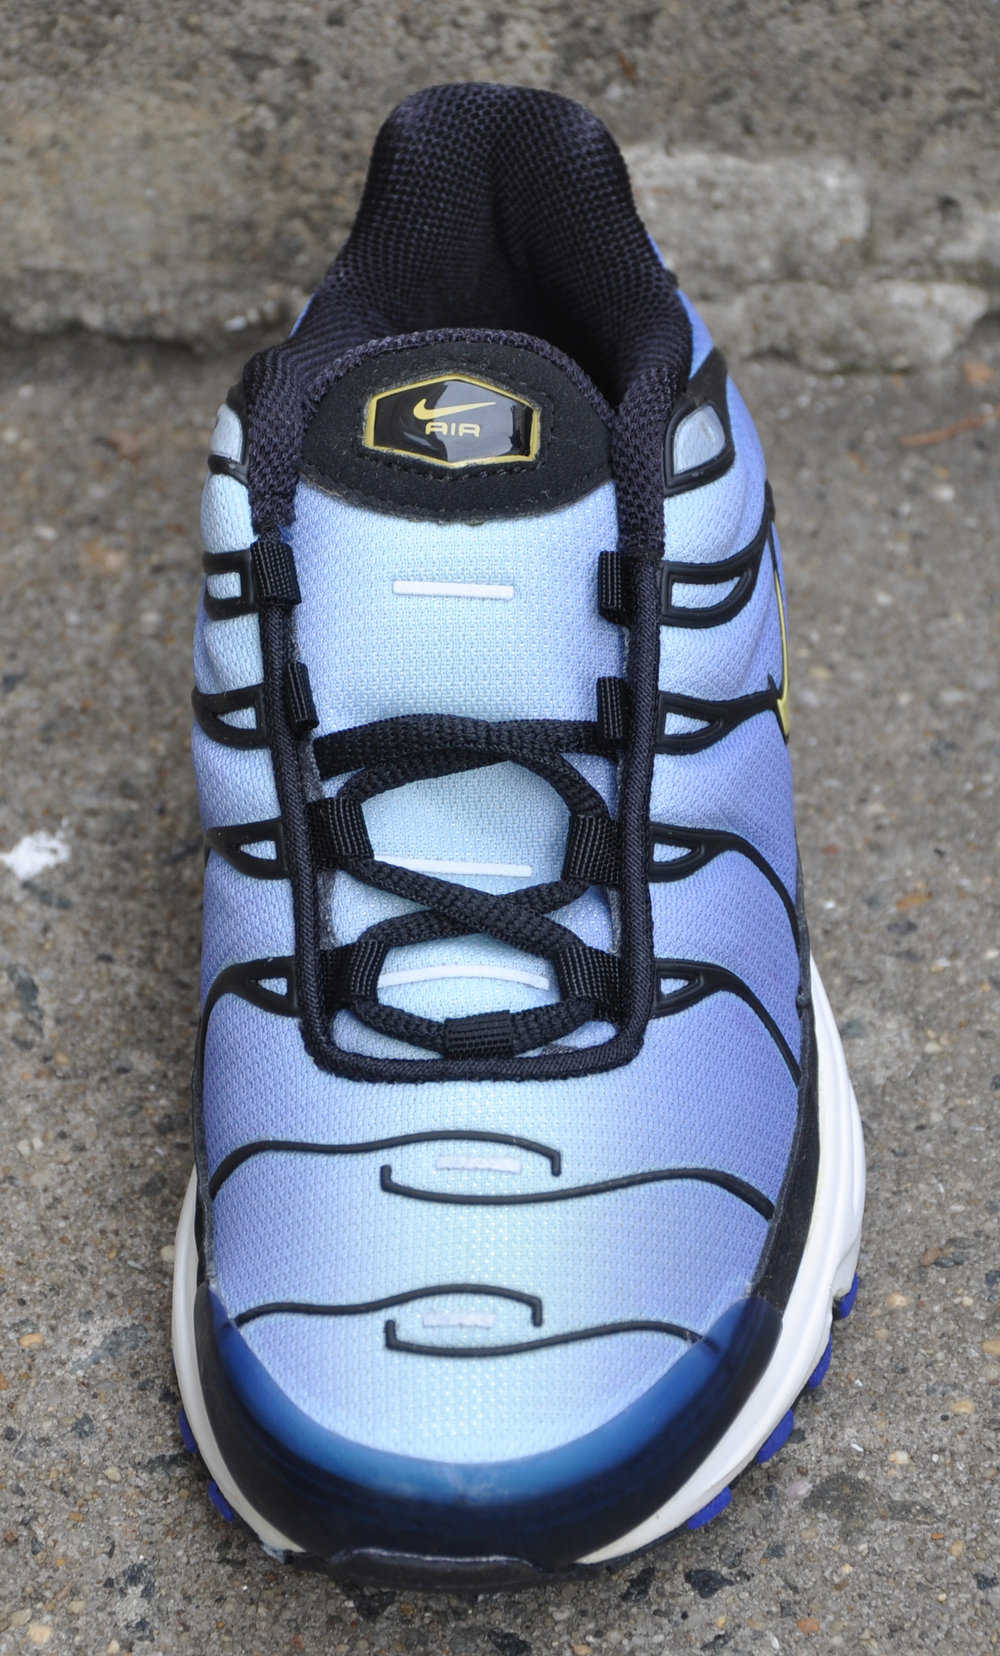 694d1bcd86 Kids Nike Air Max Plus TN Hyper Blue DS — Roots